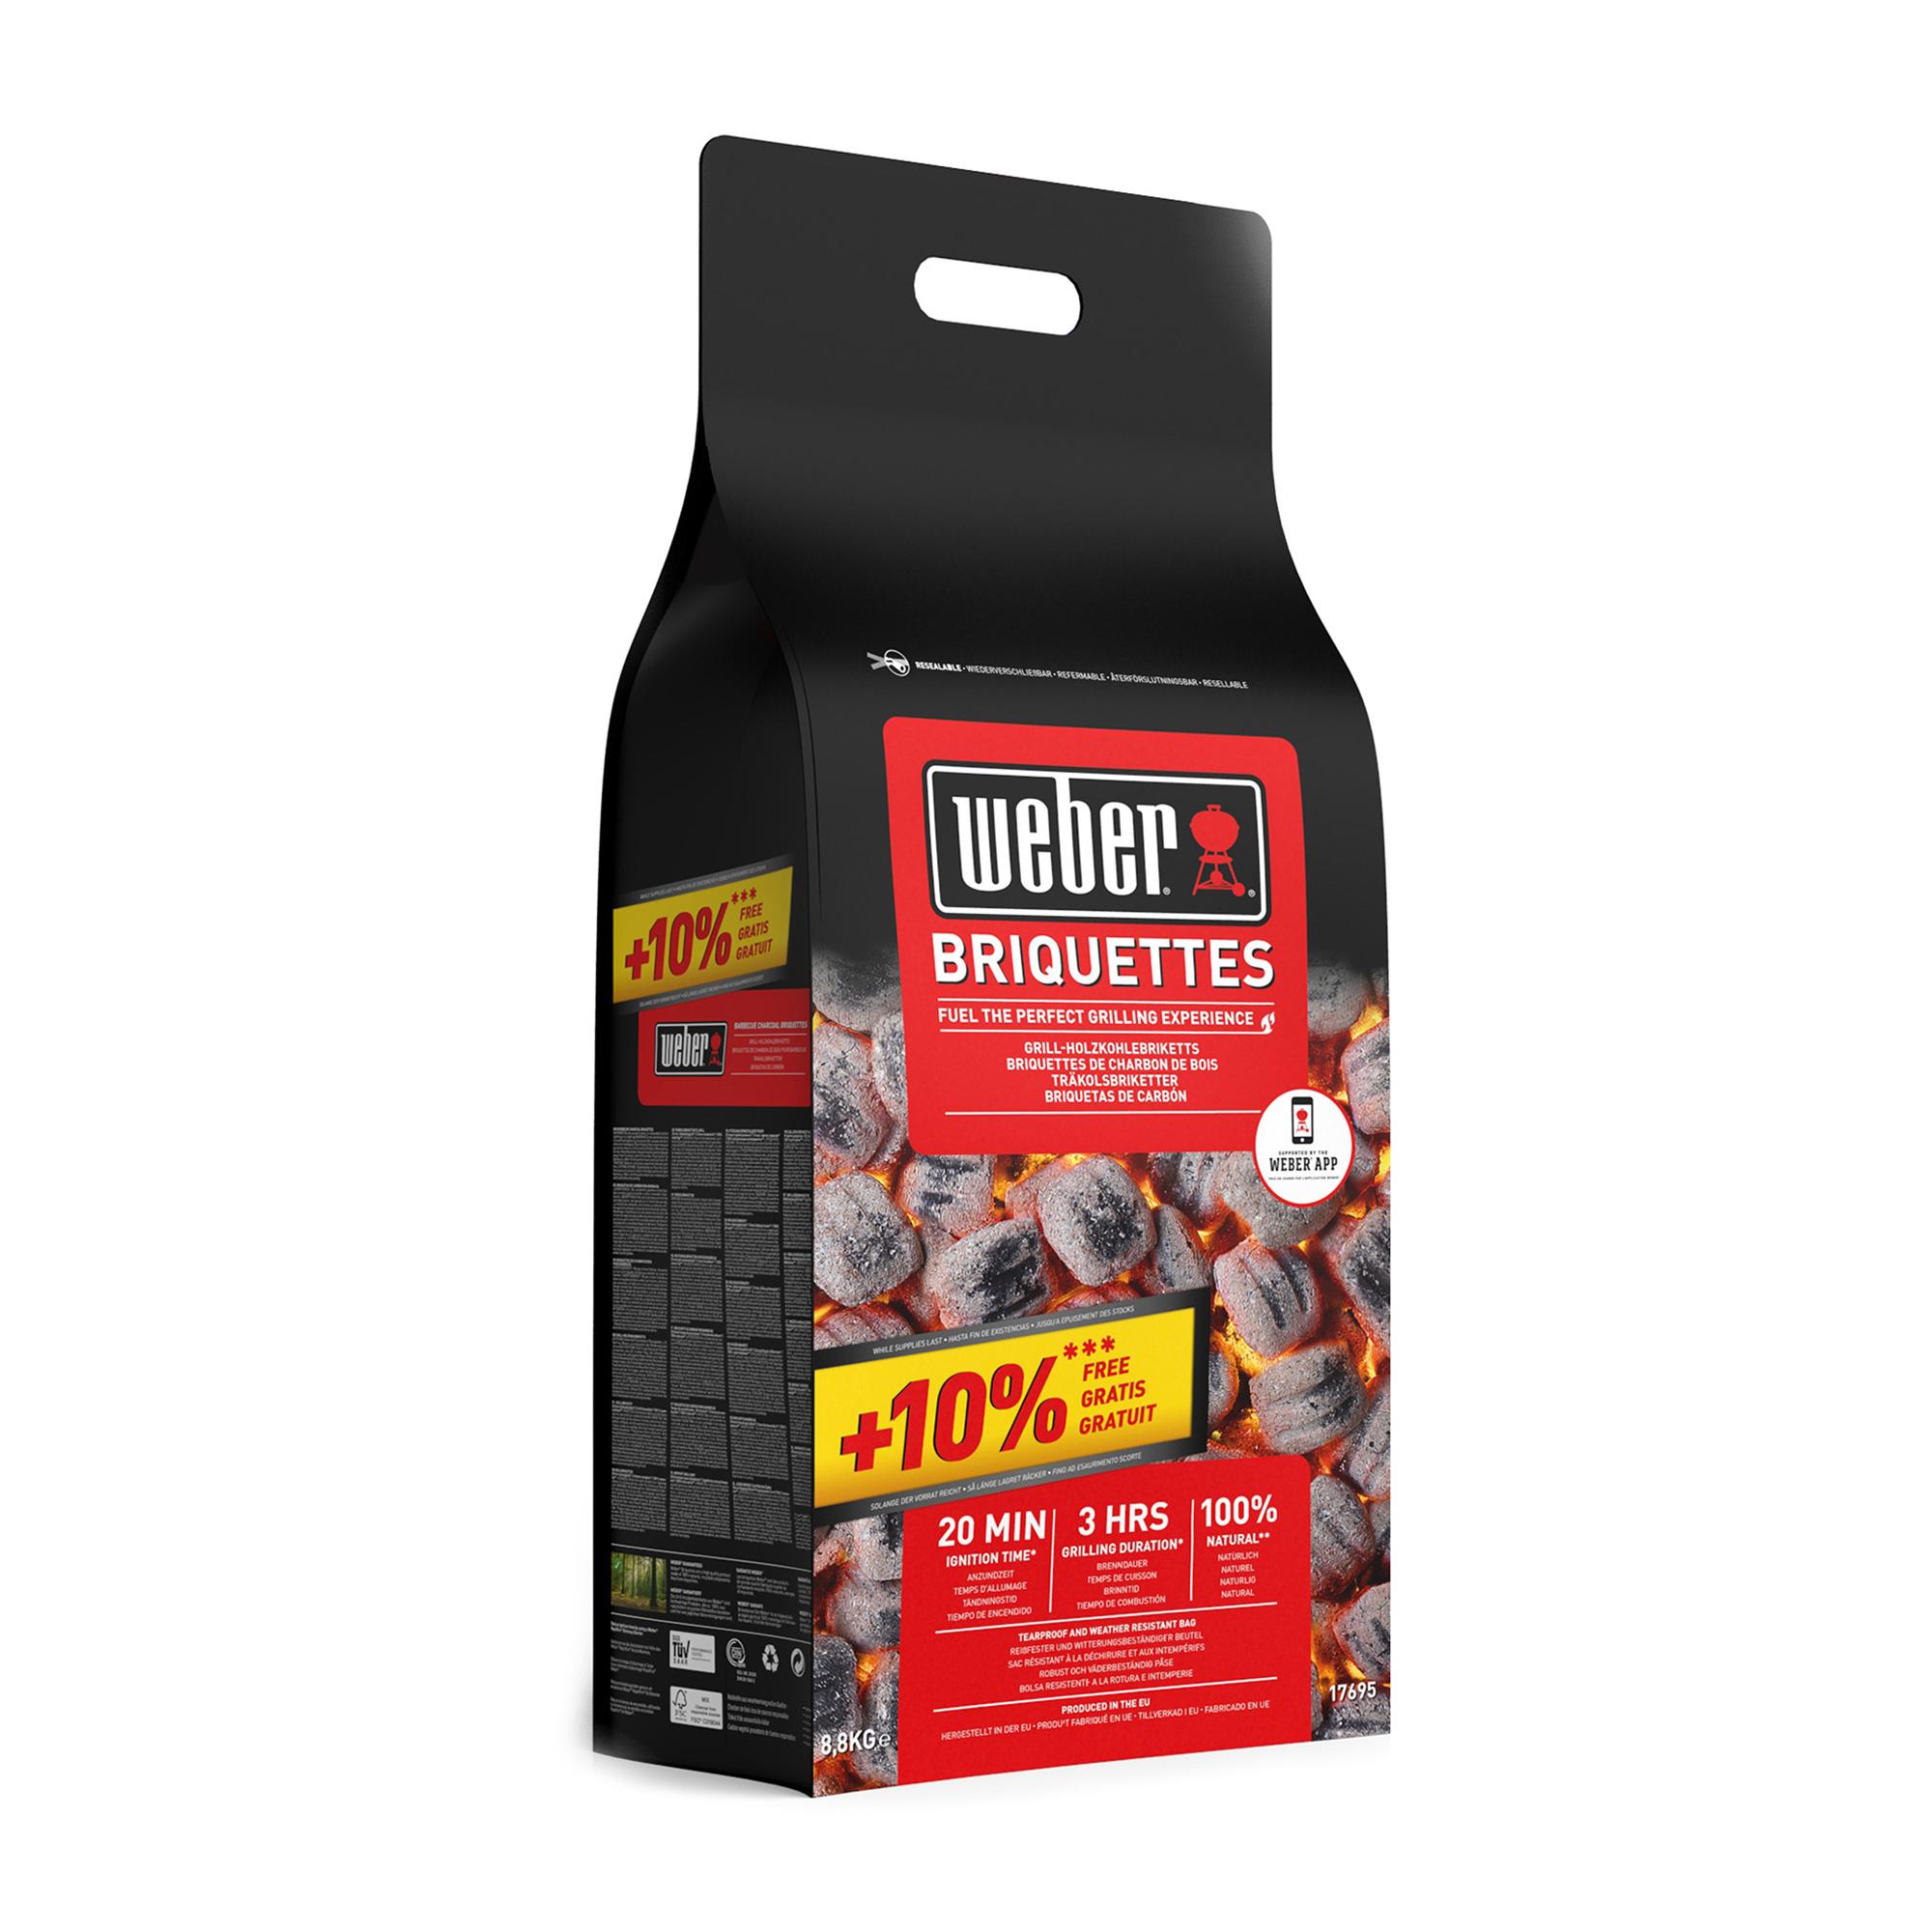 Briketts (10% gratis), 8,8kg